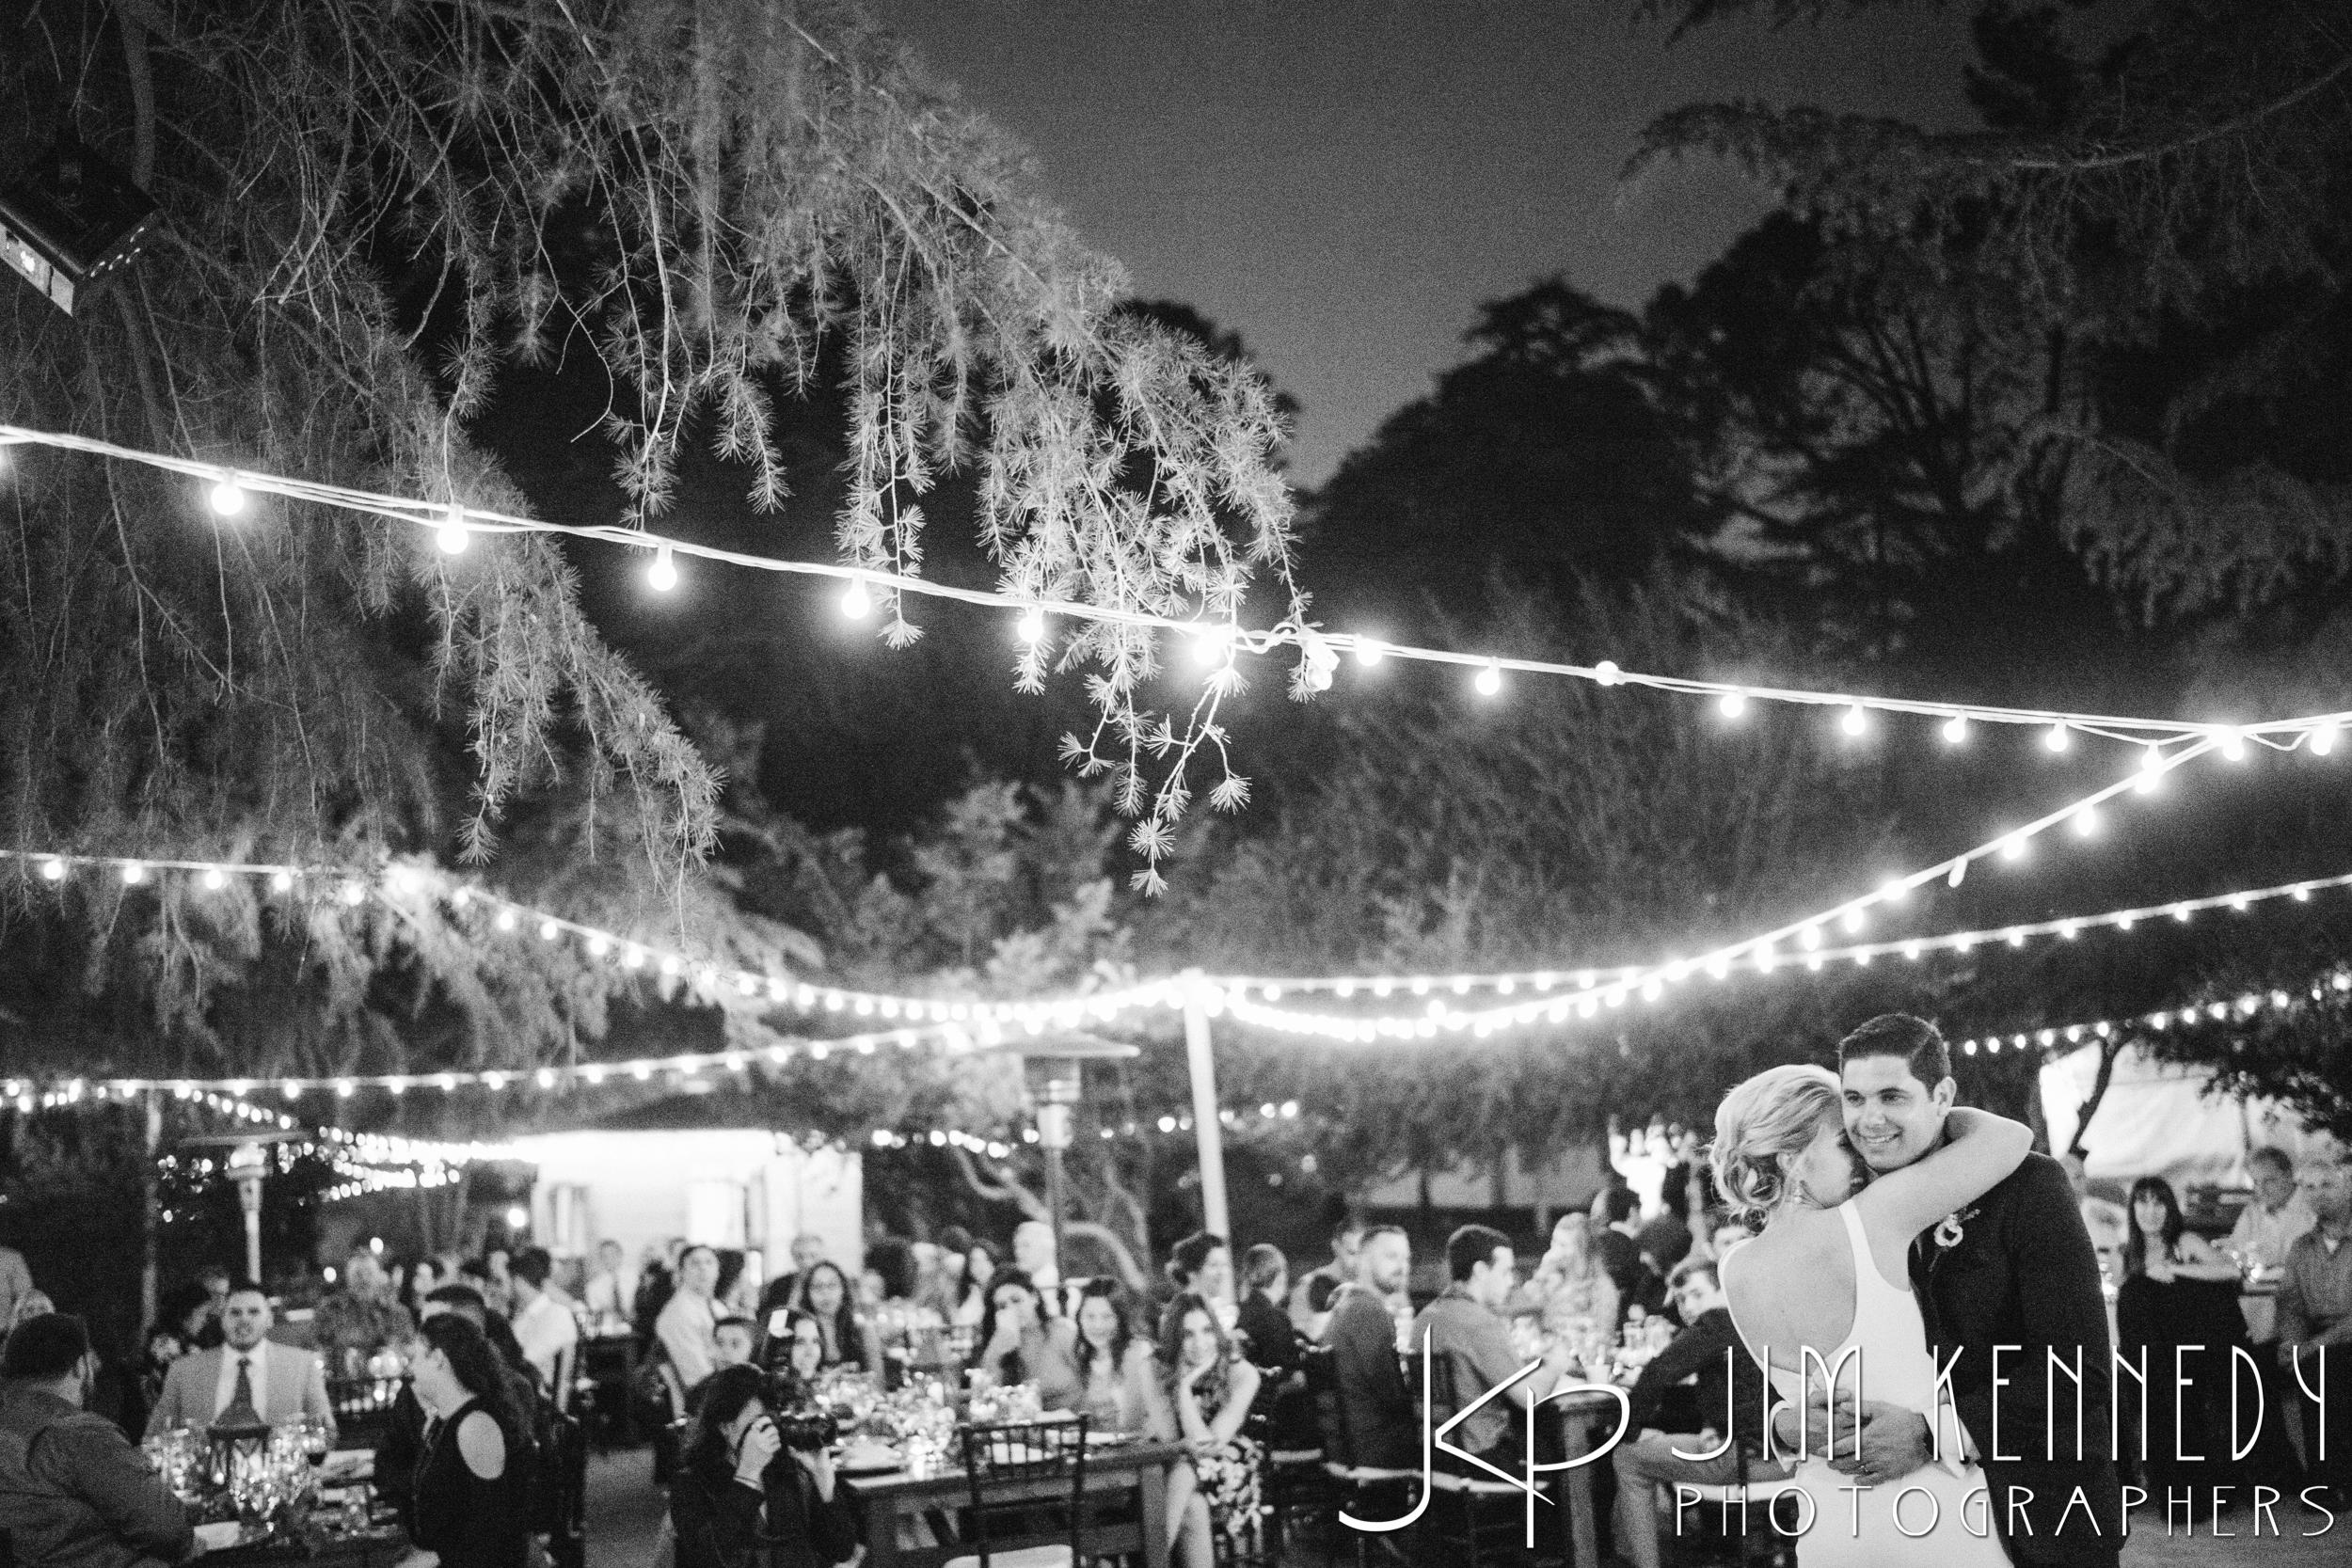 jim_kennedy_photographers_highland_springs_wedding_caitlyn_0188.jpg